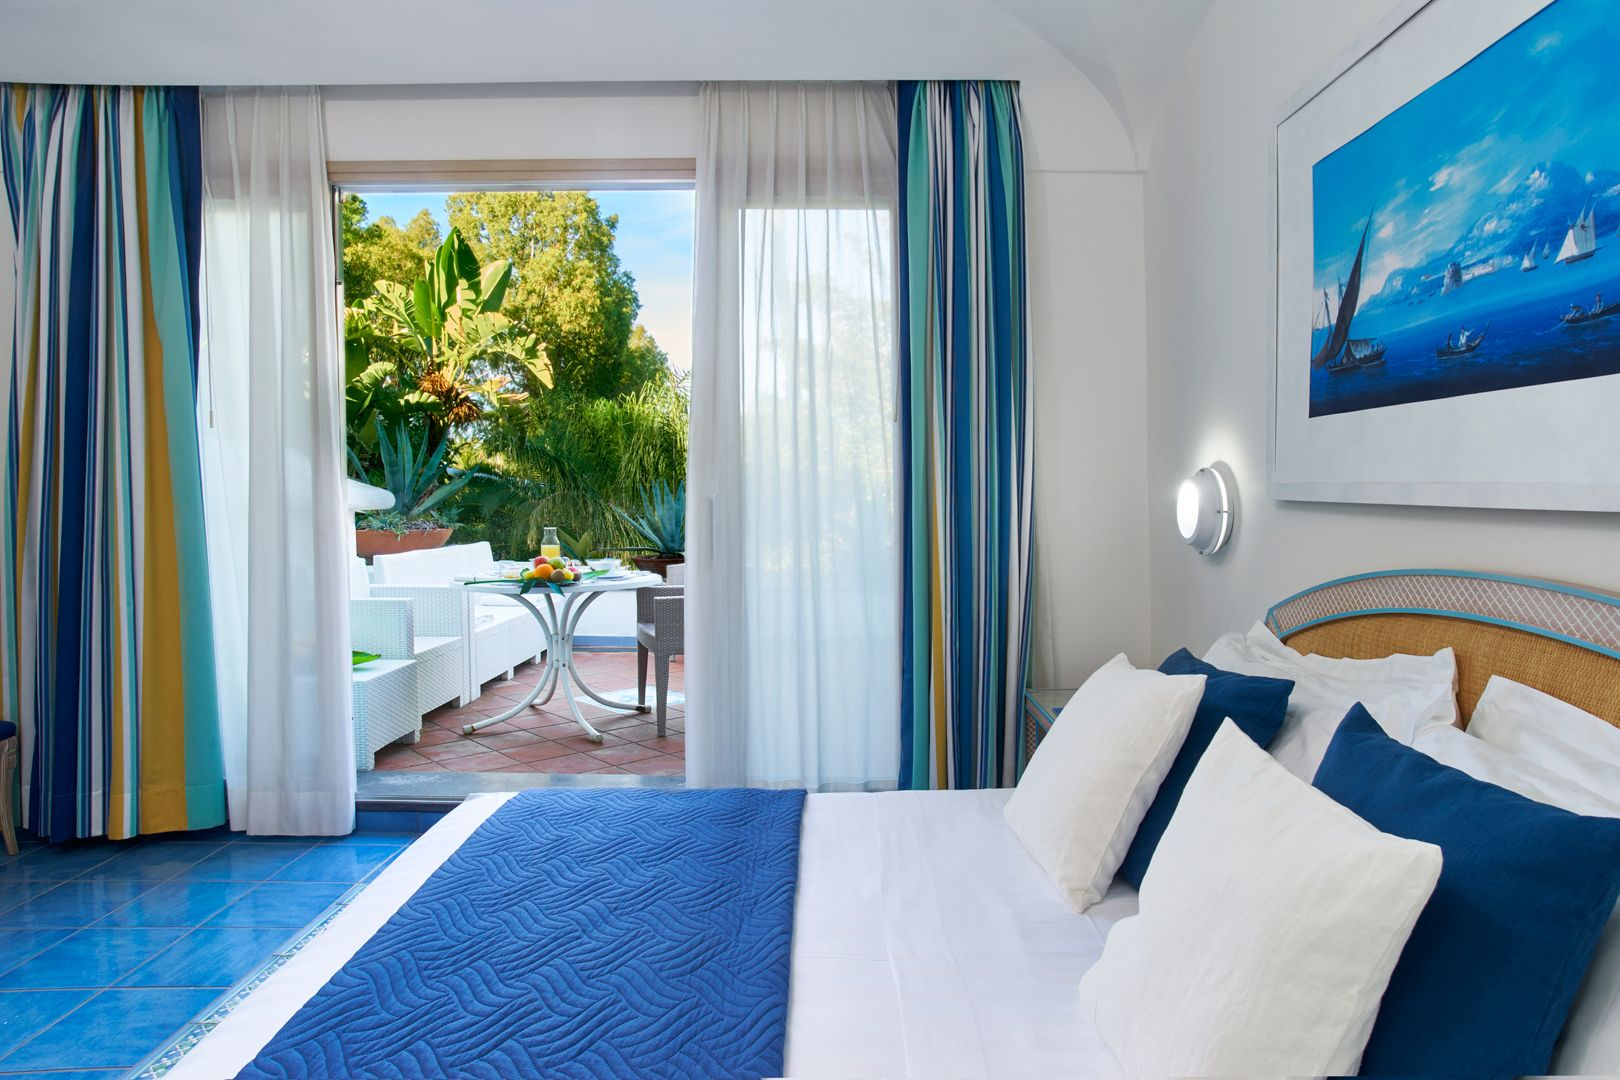 Hotel-central-park-ischia-21